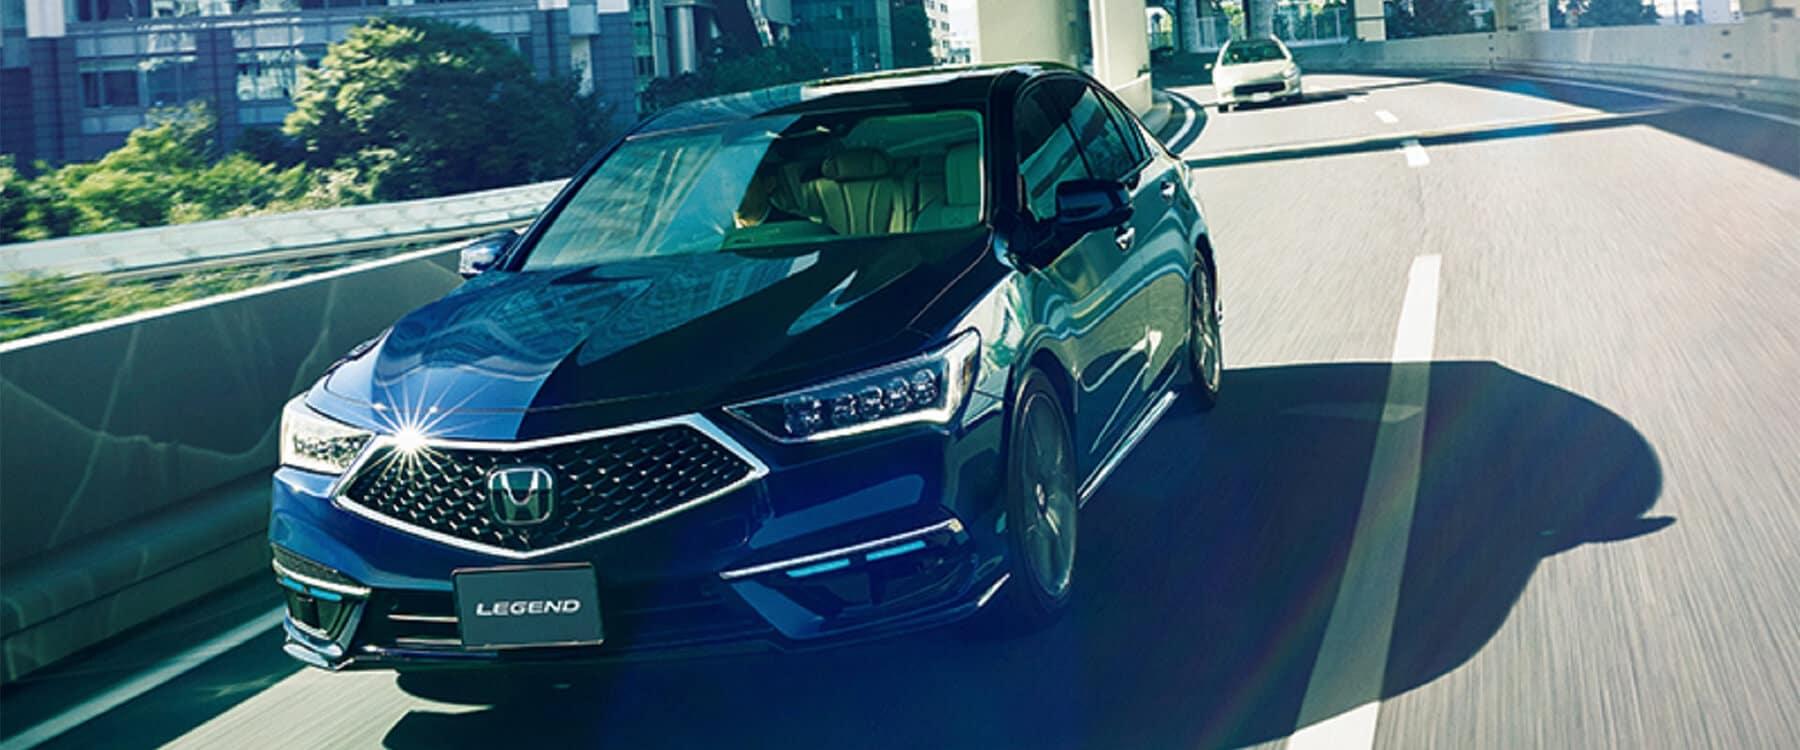 Honda Legend Hybrid with Honda Sensing Elite